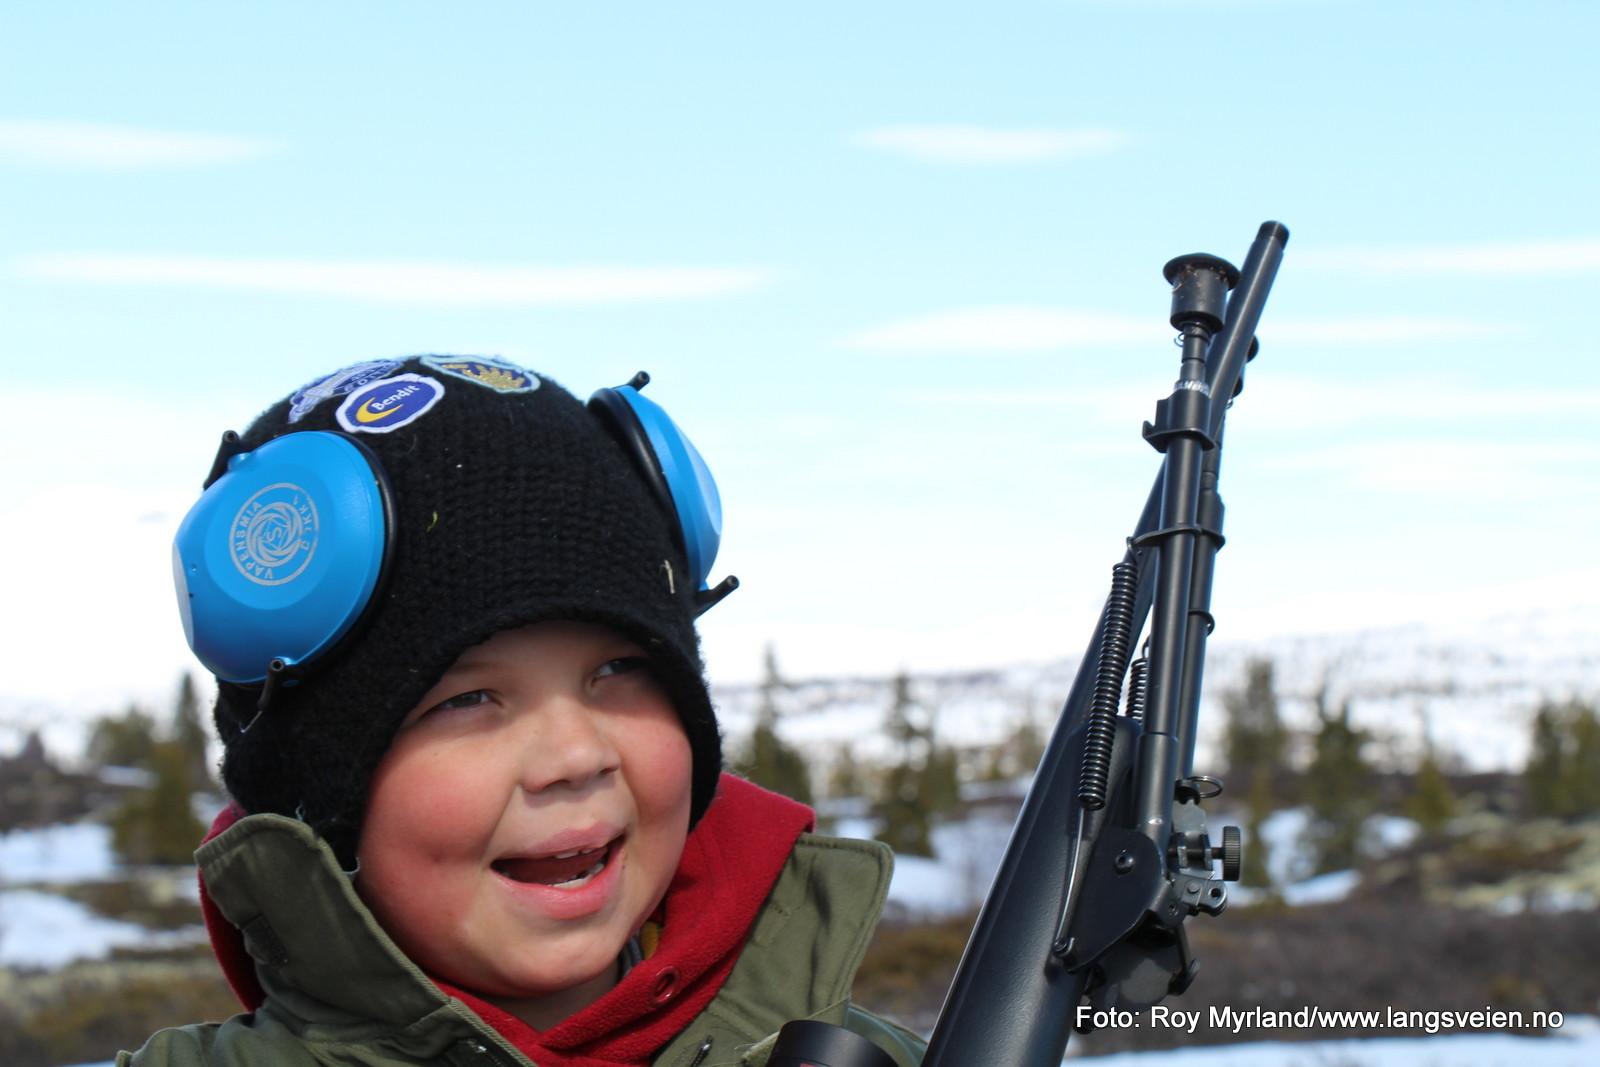 Jonny-Alexander Nrestad Skaterudstølen skytter jakt jeger foto roy myrland